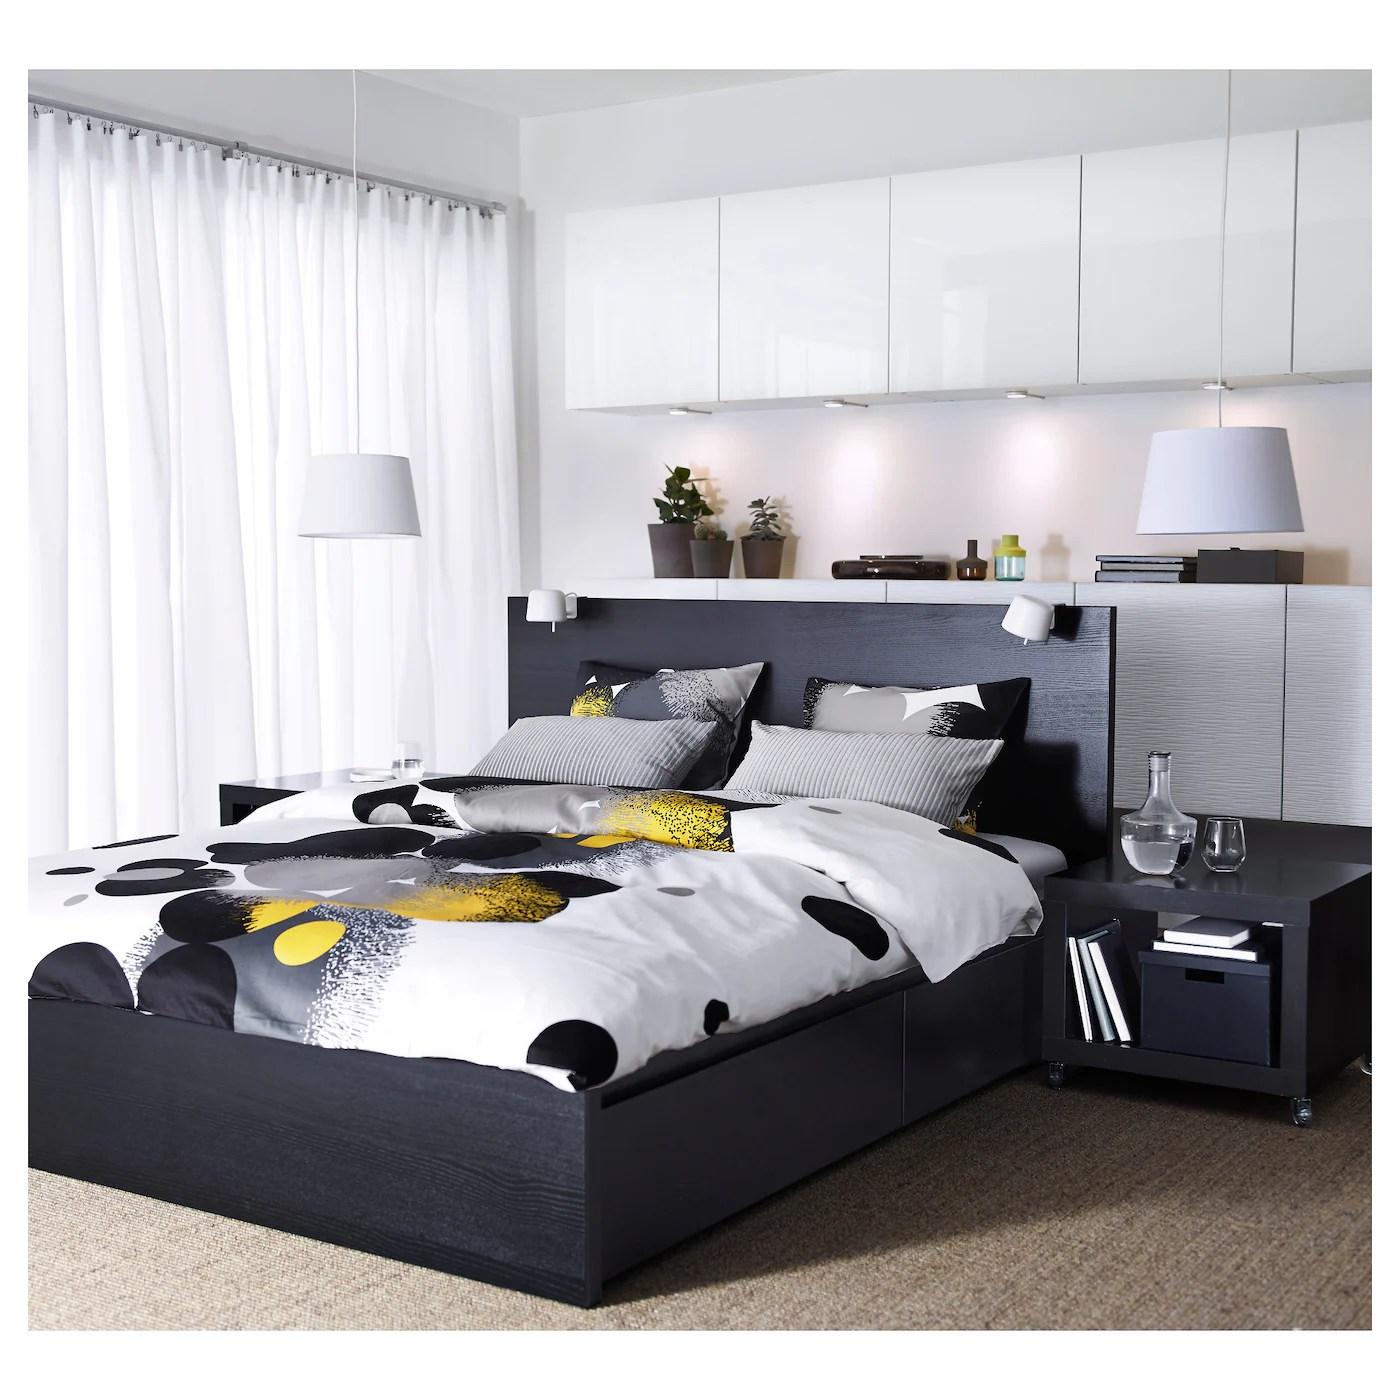 Verbazingwekkend Ikea Bed Spijlen. Ikea Bed Spijlen With Ikea Bed Spijlen. Bedframe SG-12